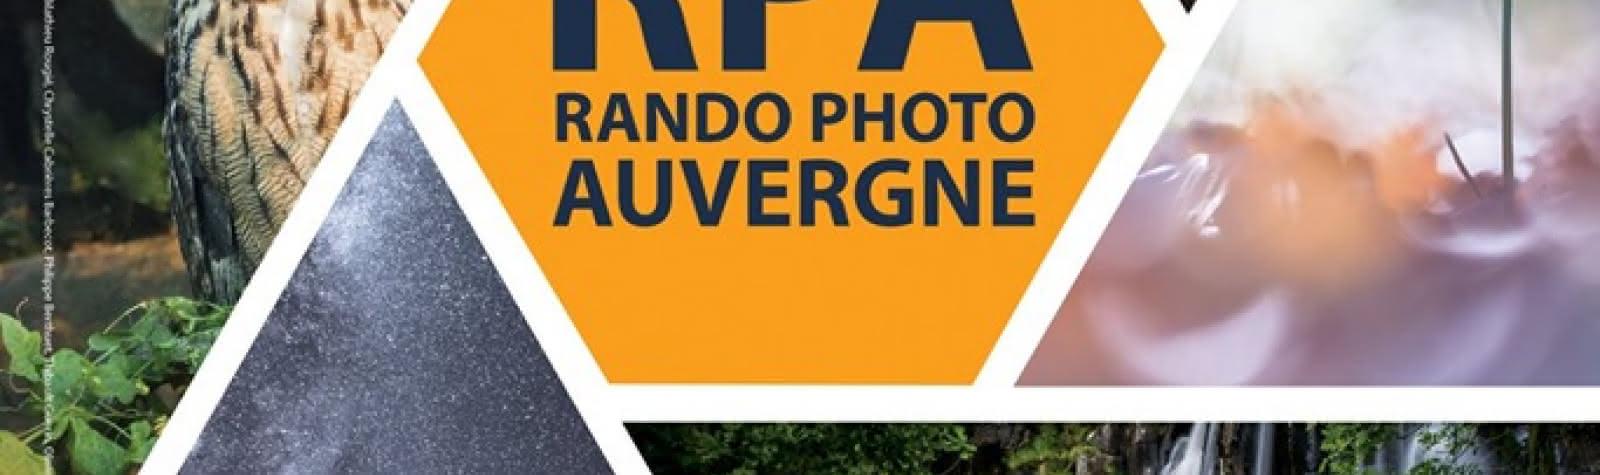 Exposition Rando Photo Auvergne